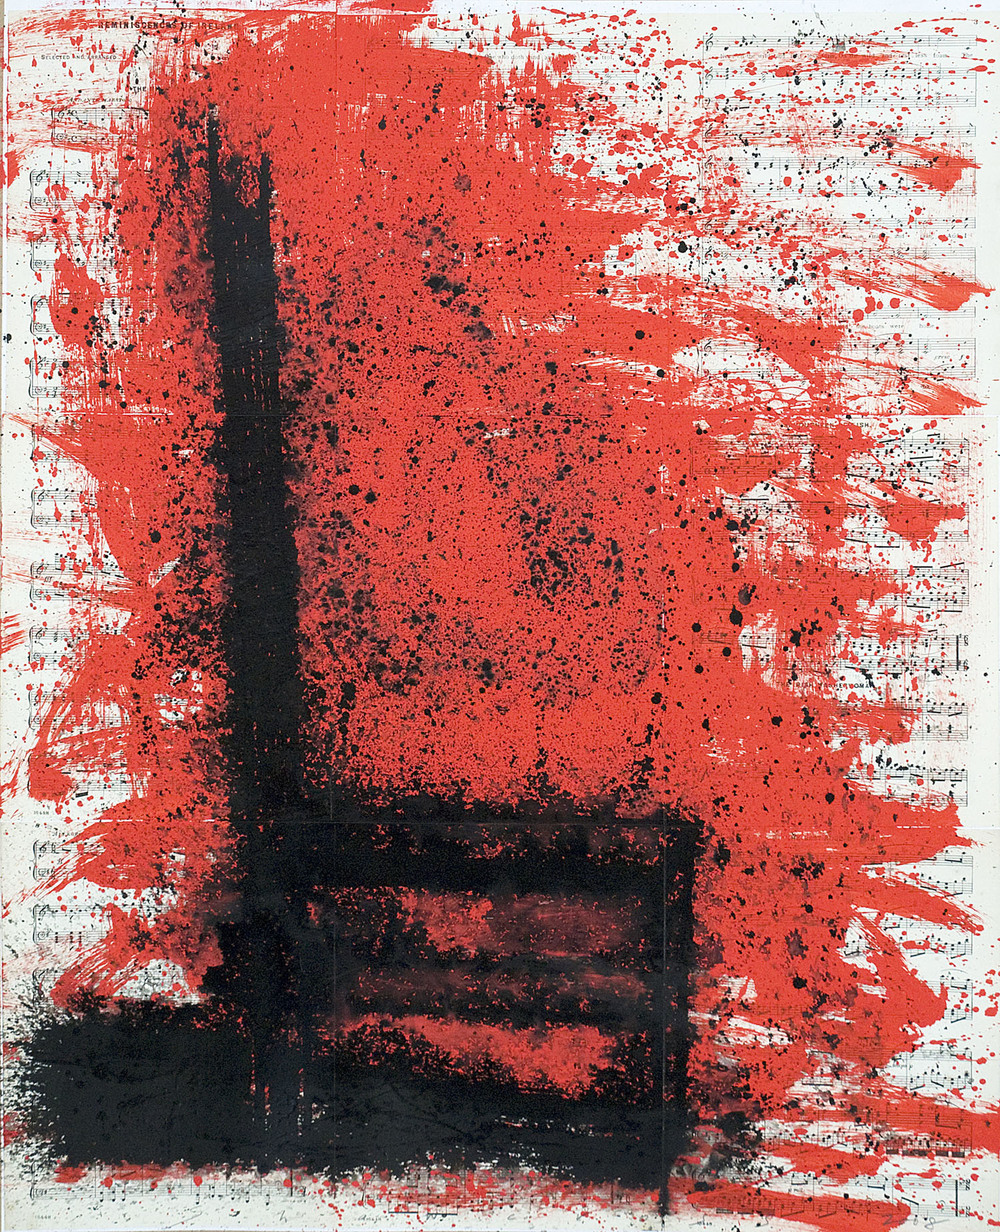 Neil Shawcross_-_#17_acrylic on paper_91.5 x 74cm.jpg